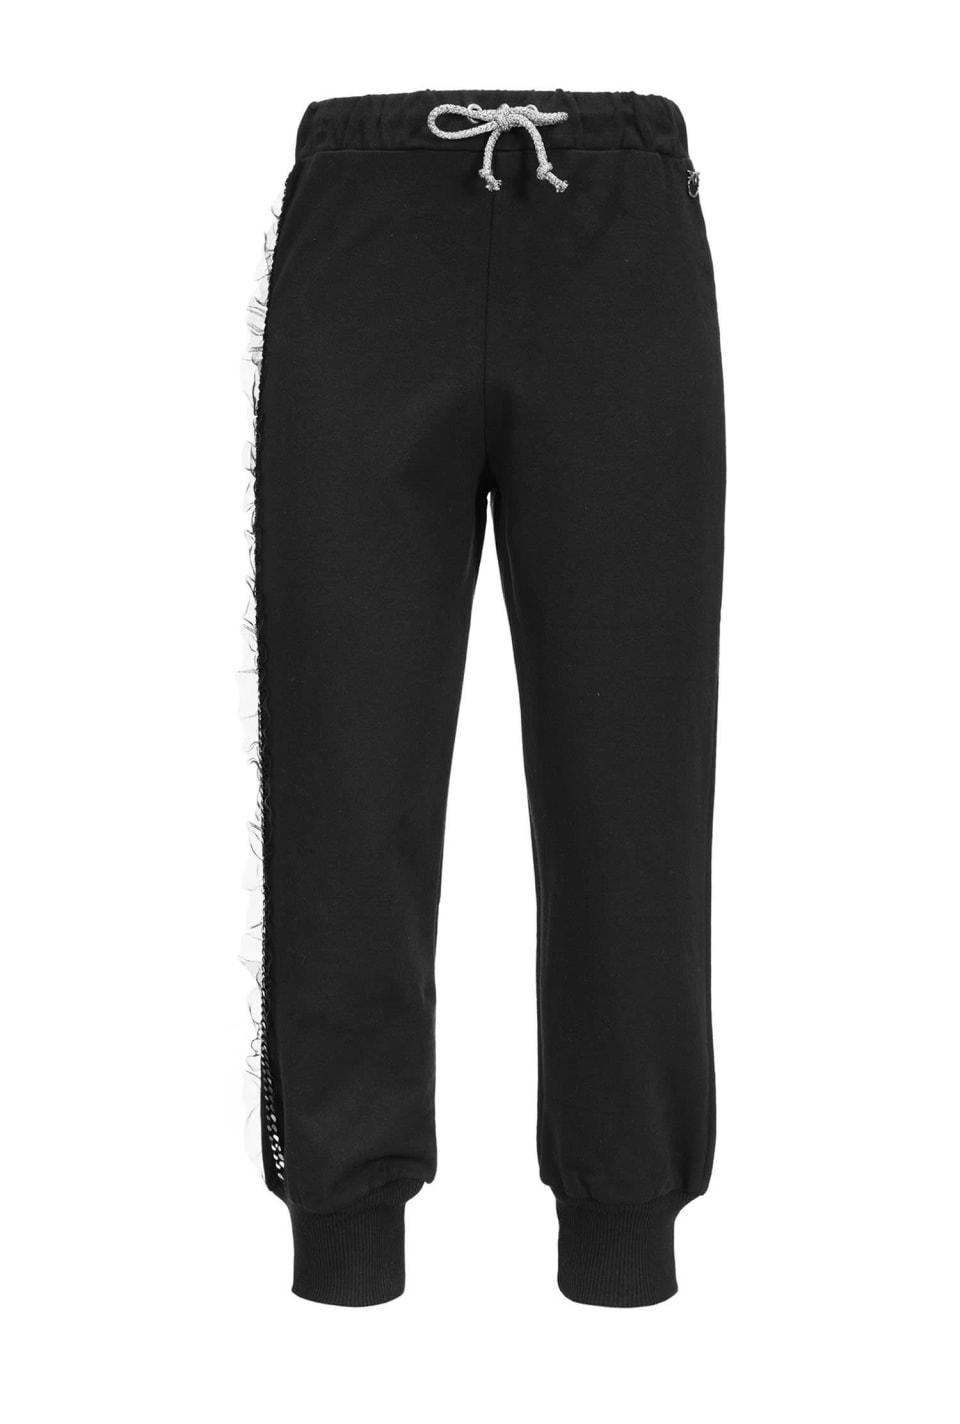 Pantalón jogging de felpa